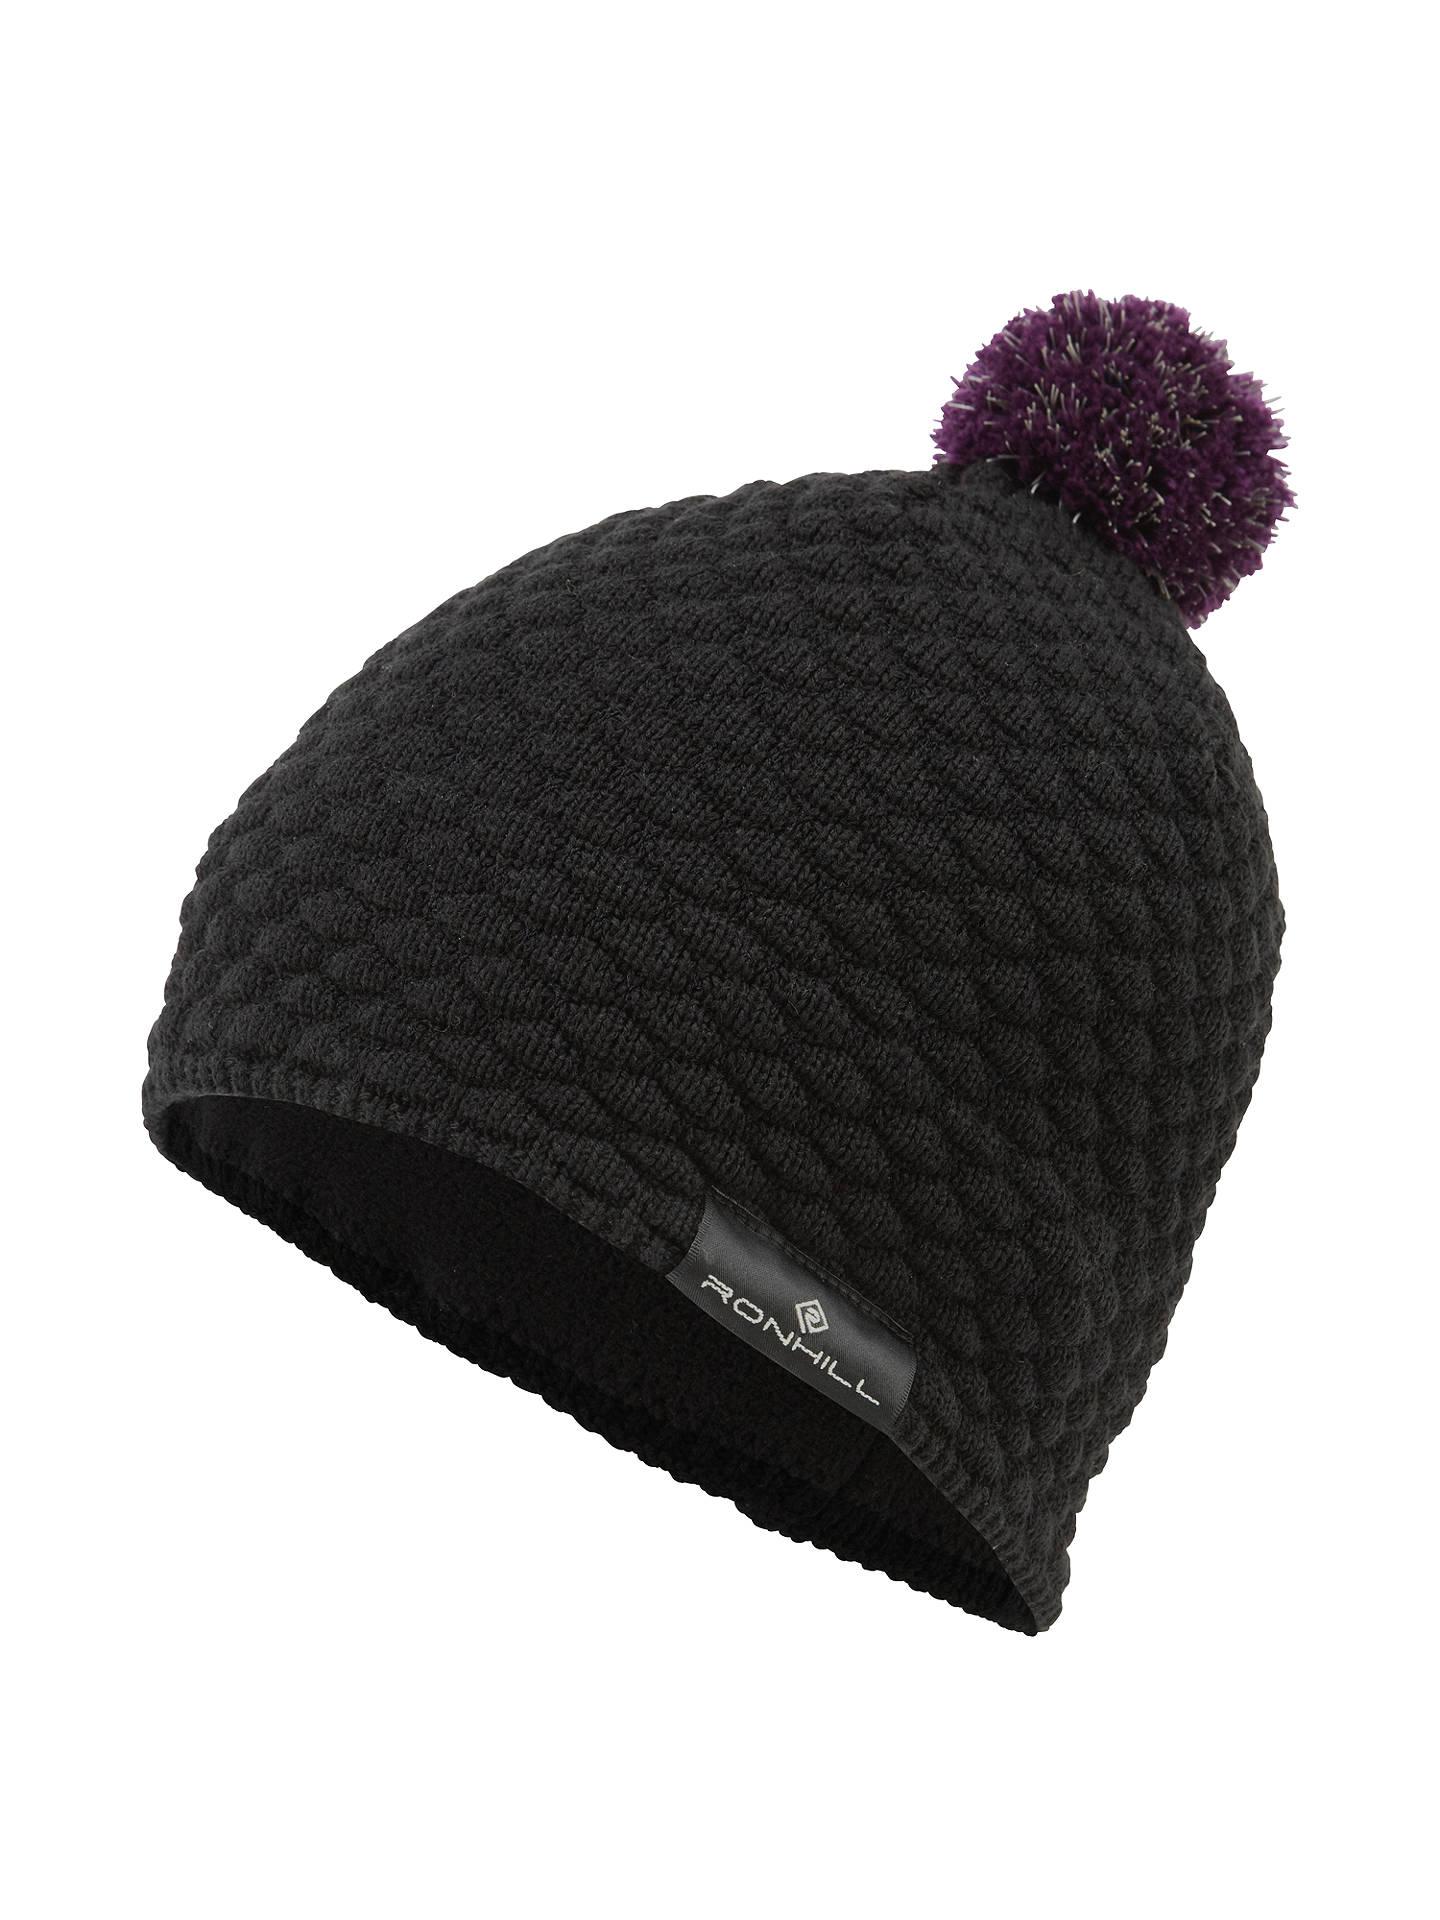 9f0fa30e Buy Ronhill Vizion Bobble Hat, One Size, Black Online at johnlewis.com